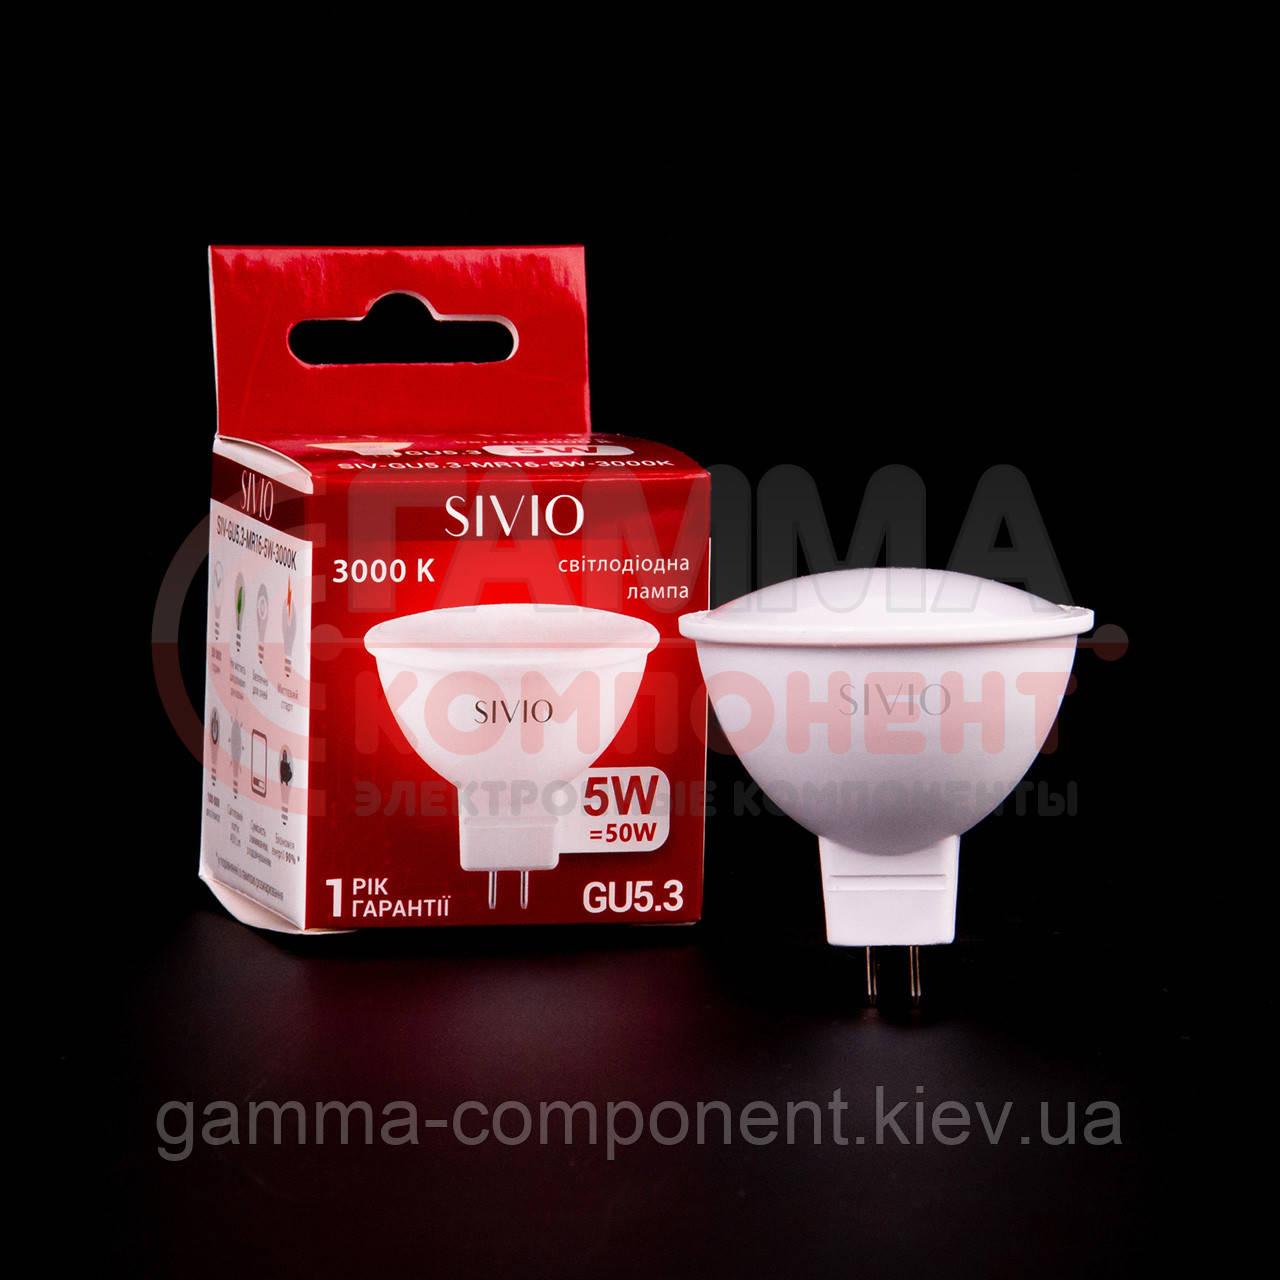 Светодиодная лампа SIVIO MR16 5W, GU5.3, 3000K, теплый белый